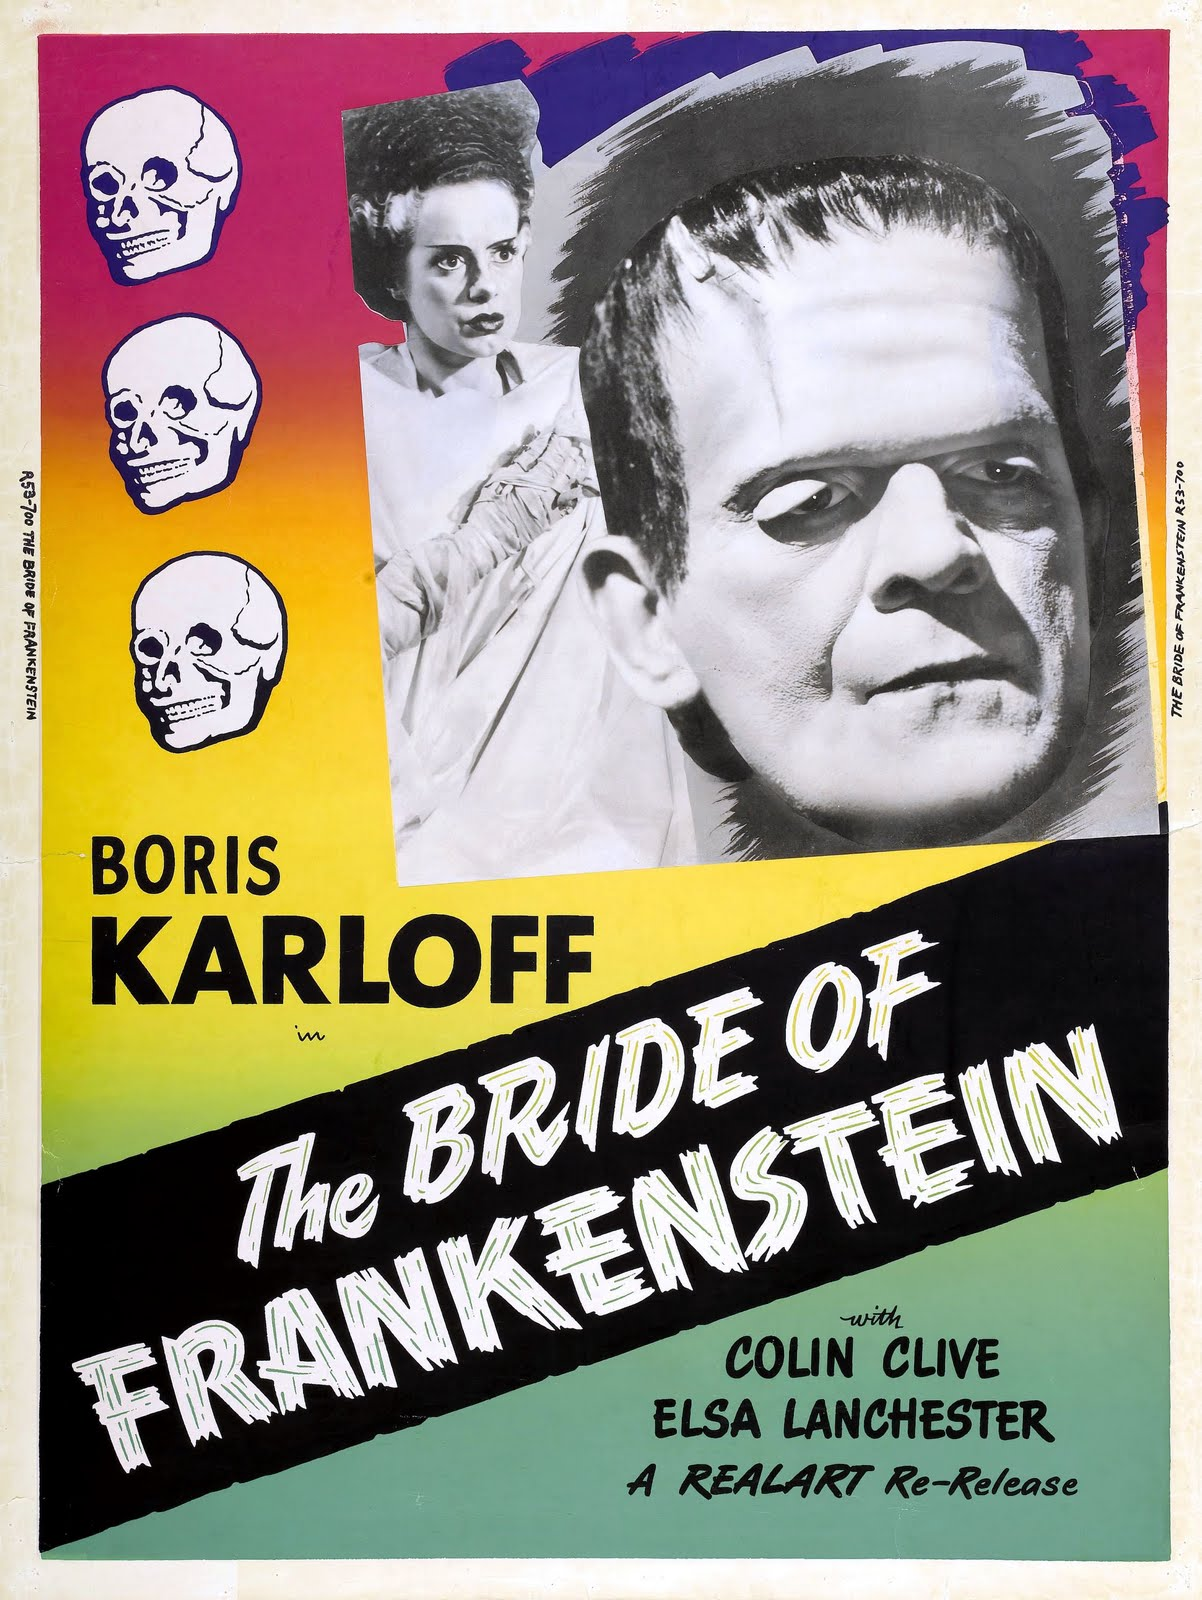 bride_of_frankenstein_poster_r_05.jpg